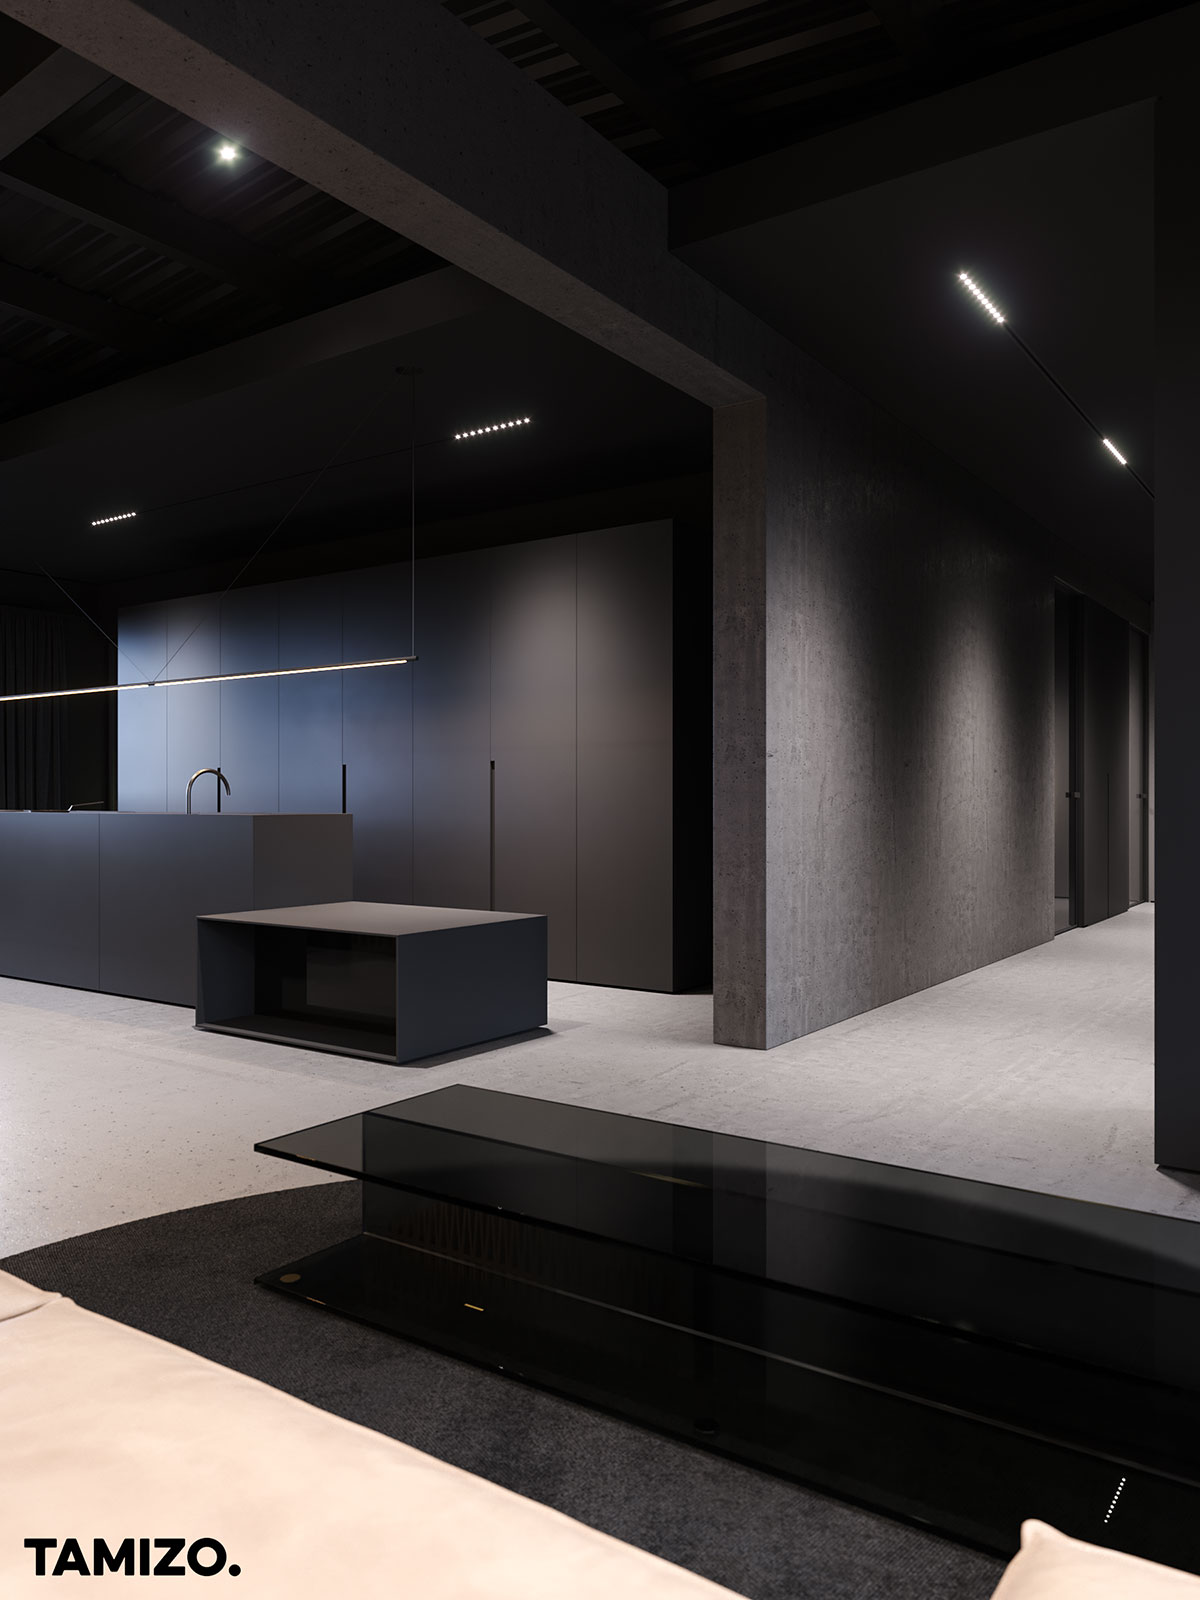 tamizo_architects_mateusz_kuo_stolarski_poznan_iterior_design_apartment_penthouse_04